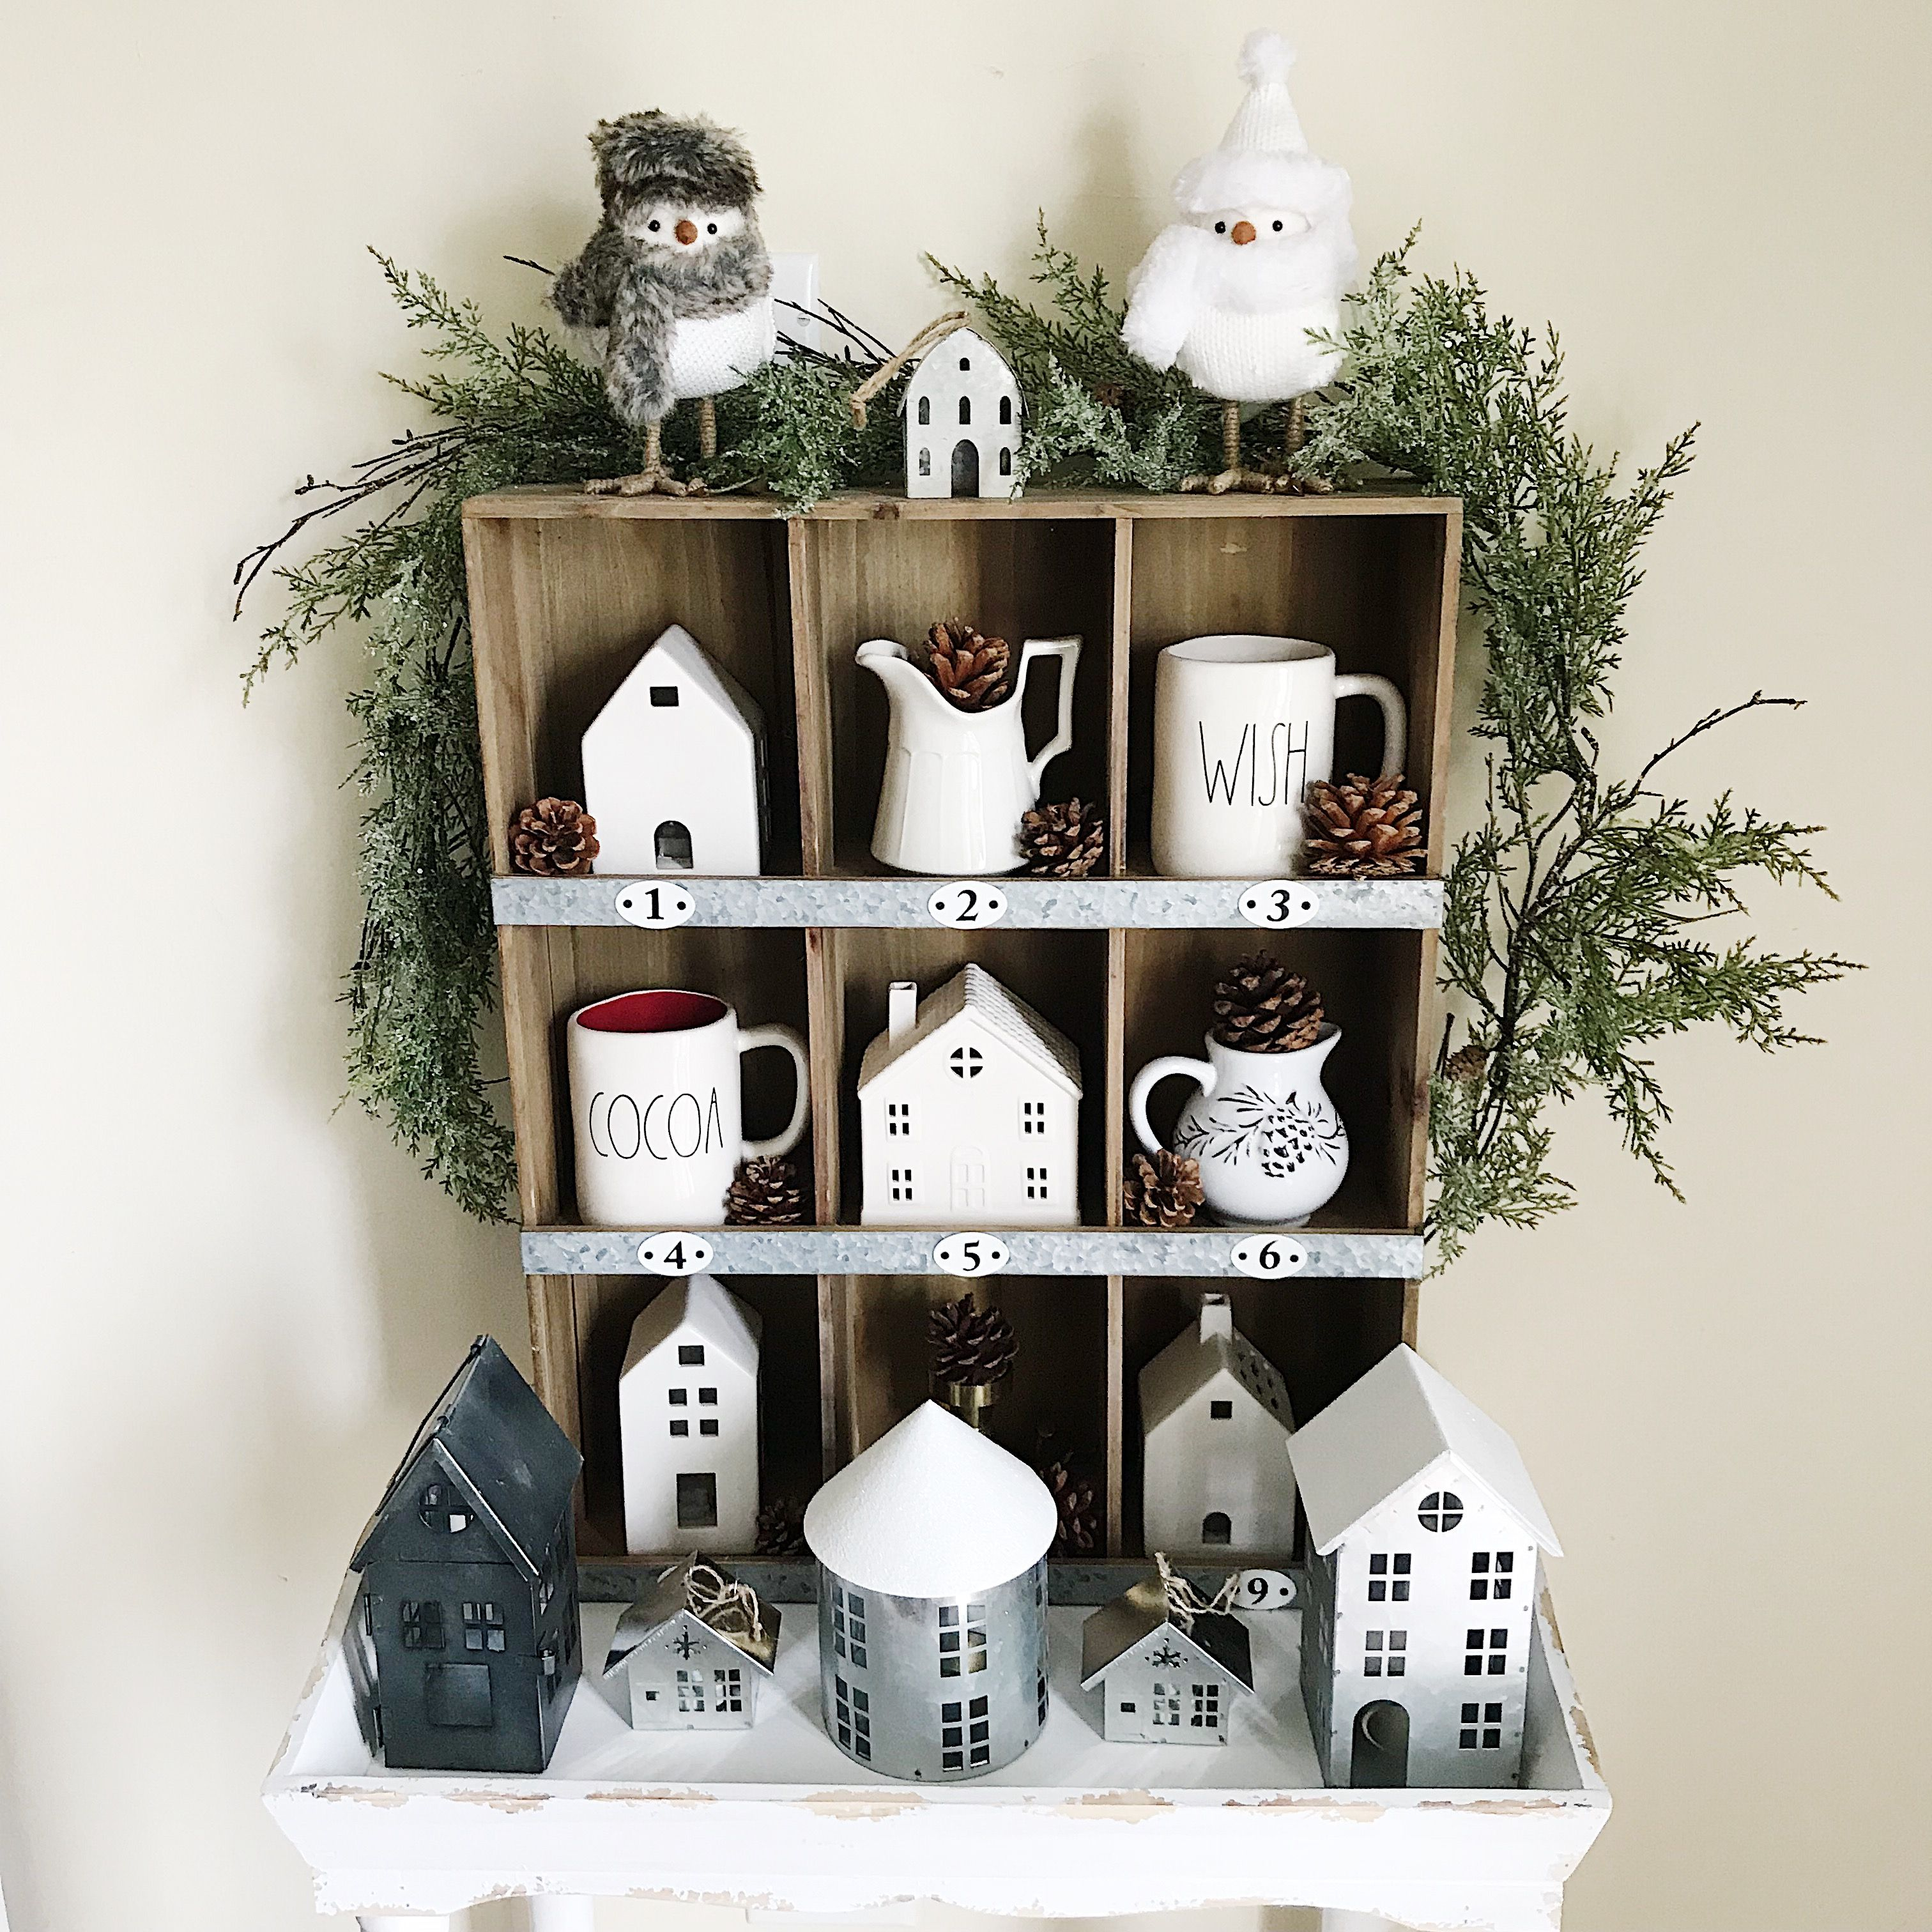 Farmhouse Shelf Styled For Winter With White Ceramic Houses Galvanized Metal Houses And White Decor Christmas Decorations Farmhouse Shelves Ceramic Houses